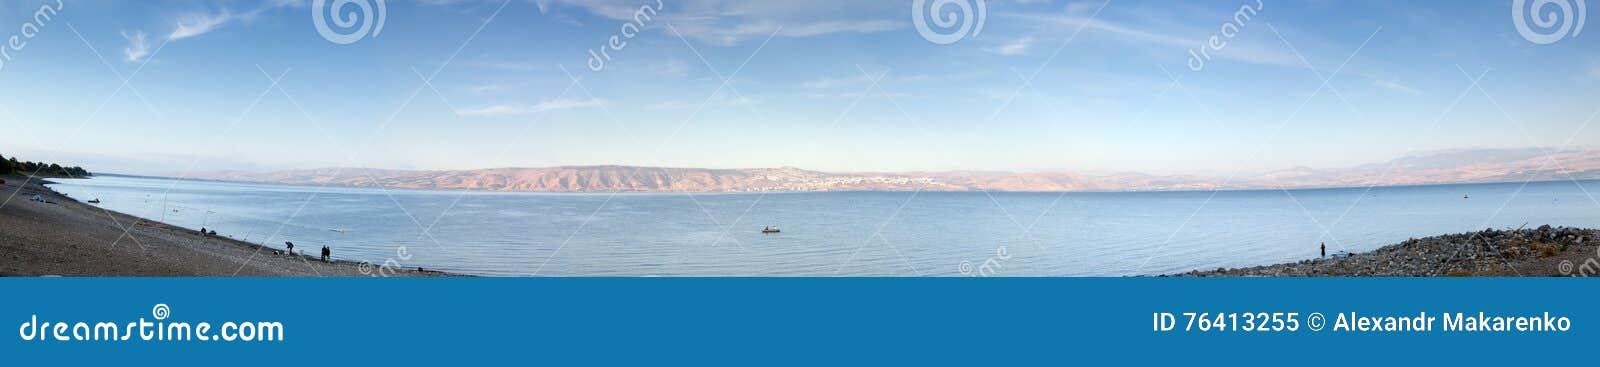 Panorama Sea of Galilee in the early morning.